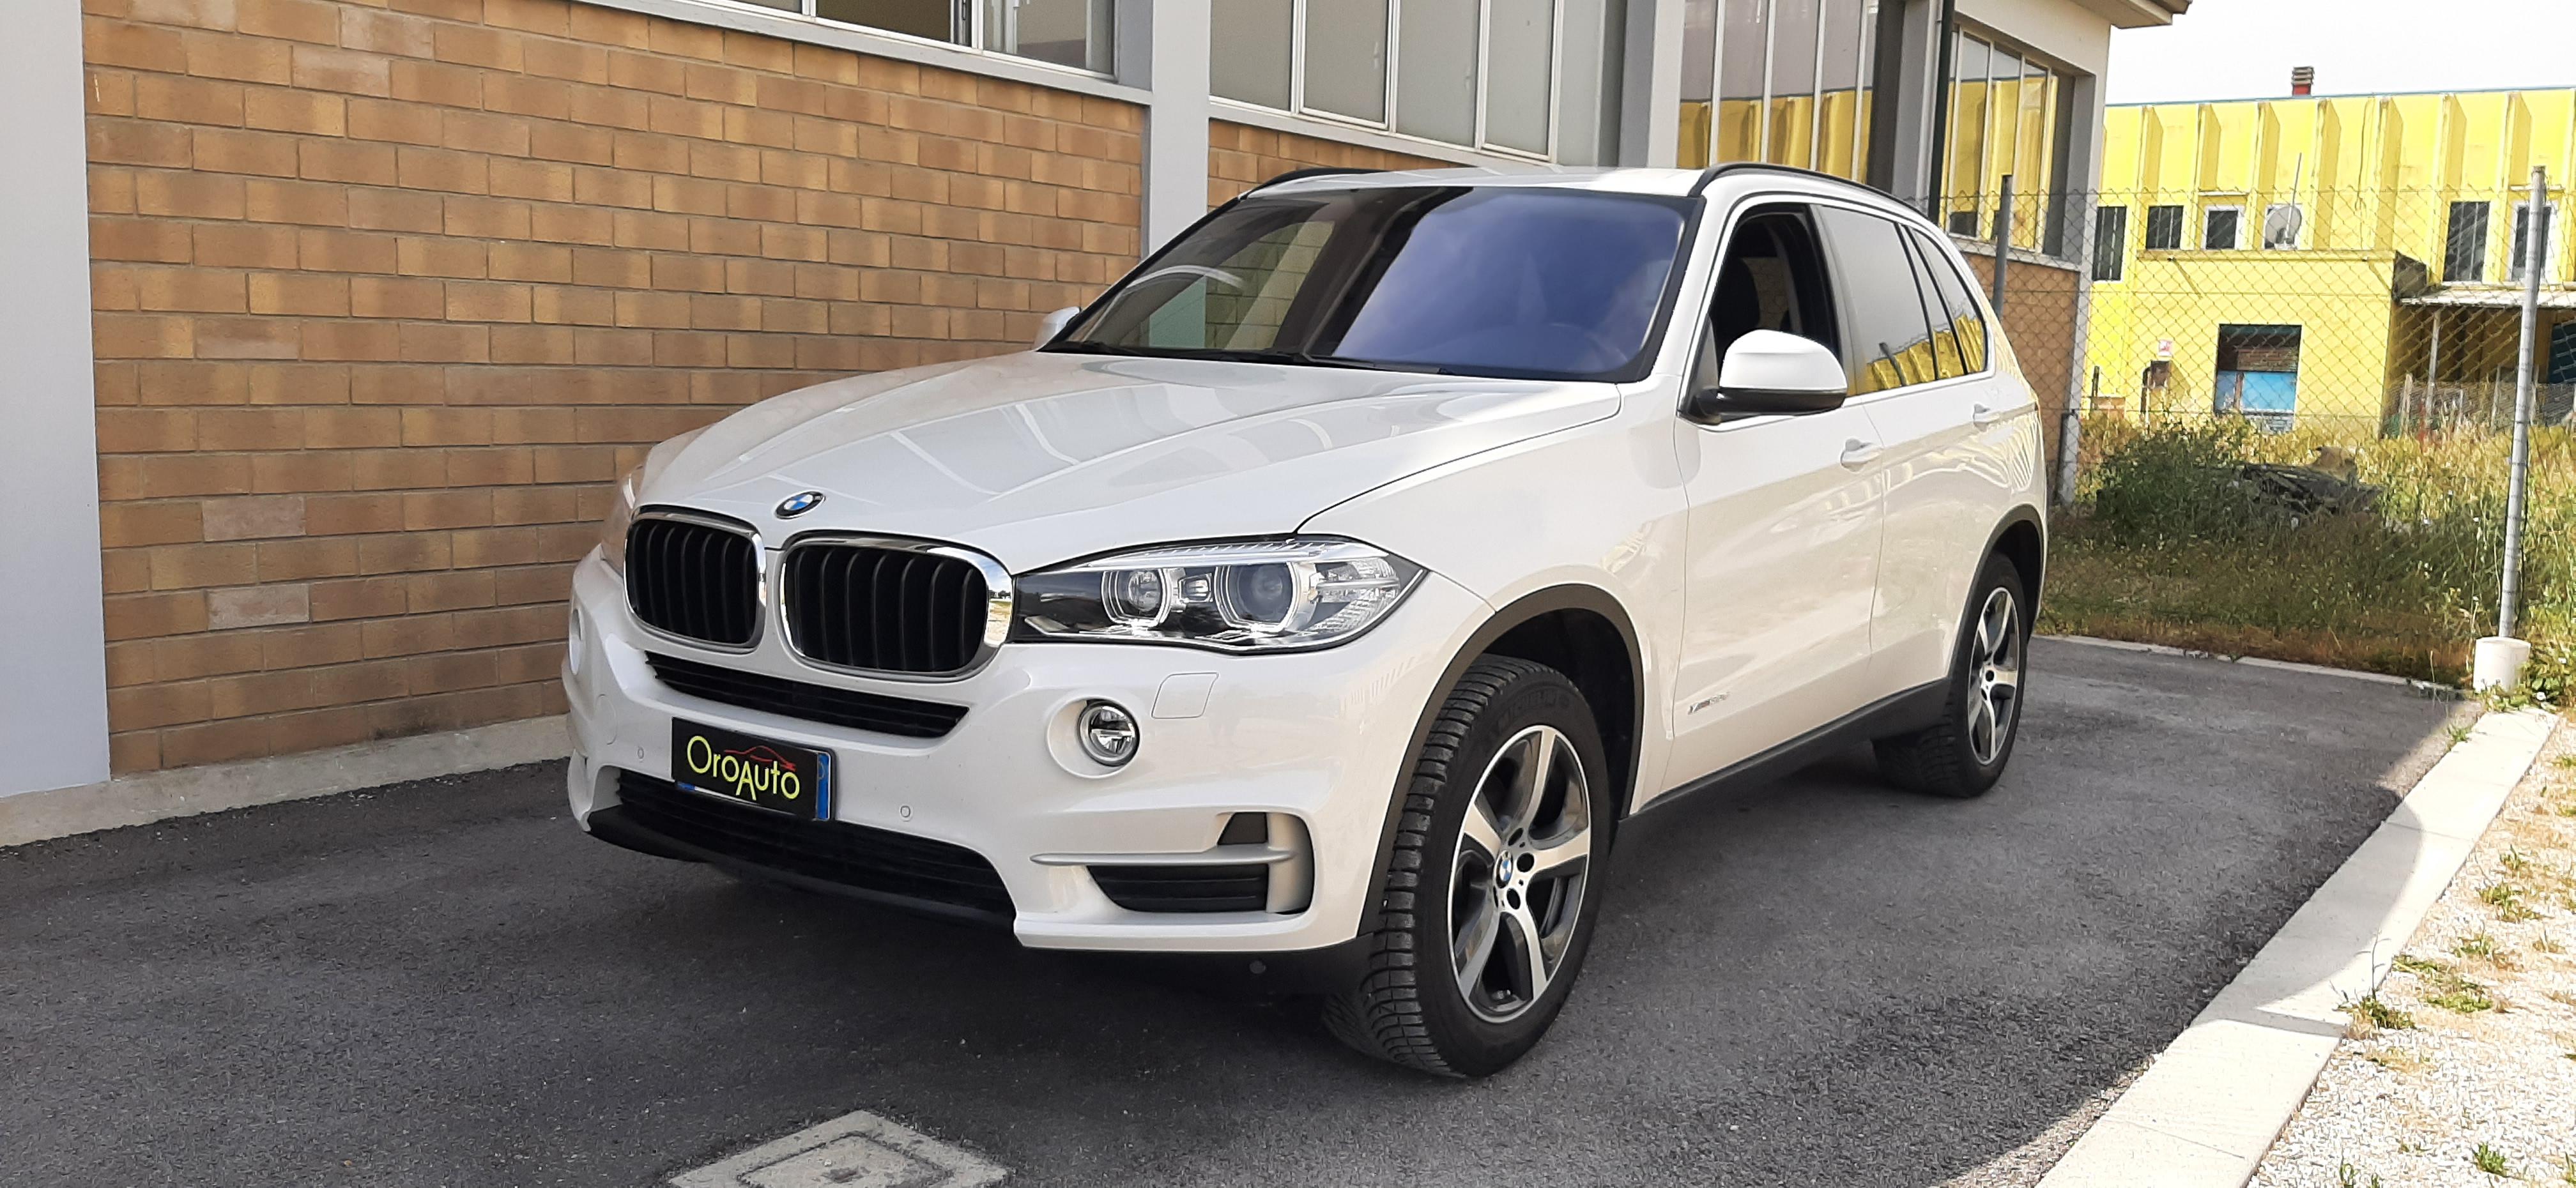 BMW X5 xDrive30d 258CV Business-NAVI-XENO-CRUISE-BANG&OLUFSEN